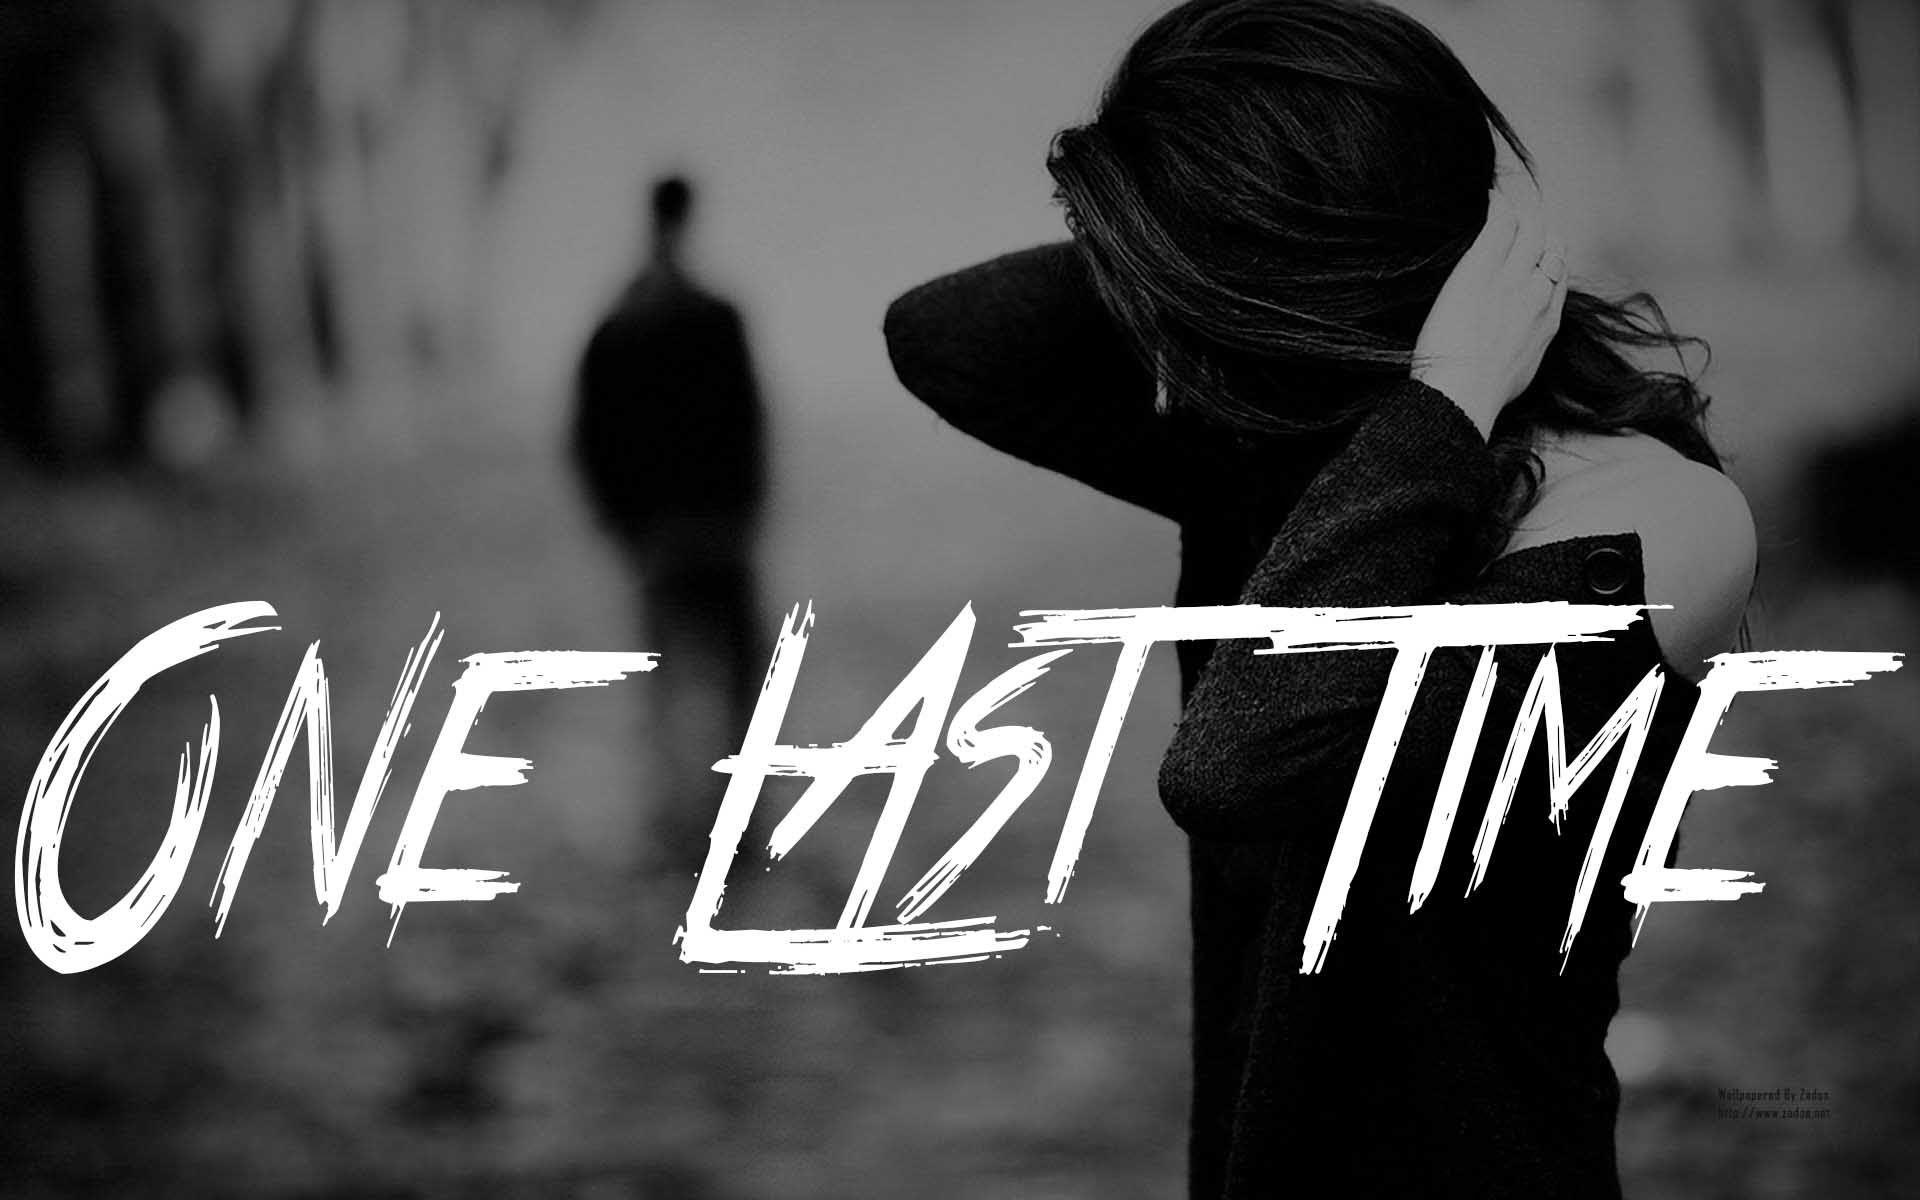 ONE LAST TIME - Sad Emotional Crying Rap Beat Hip Hop